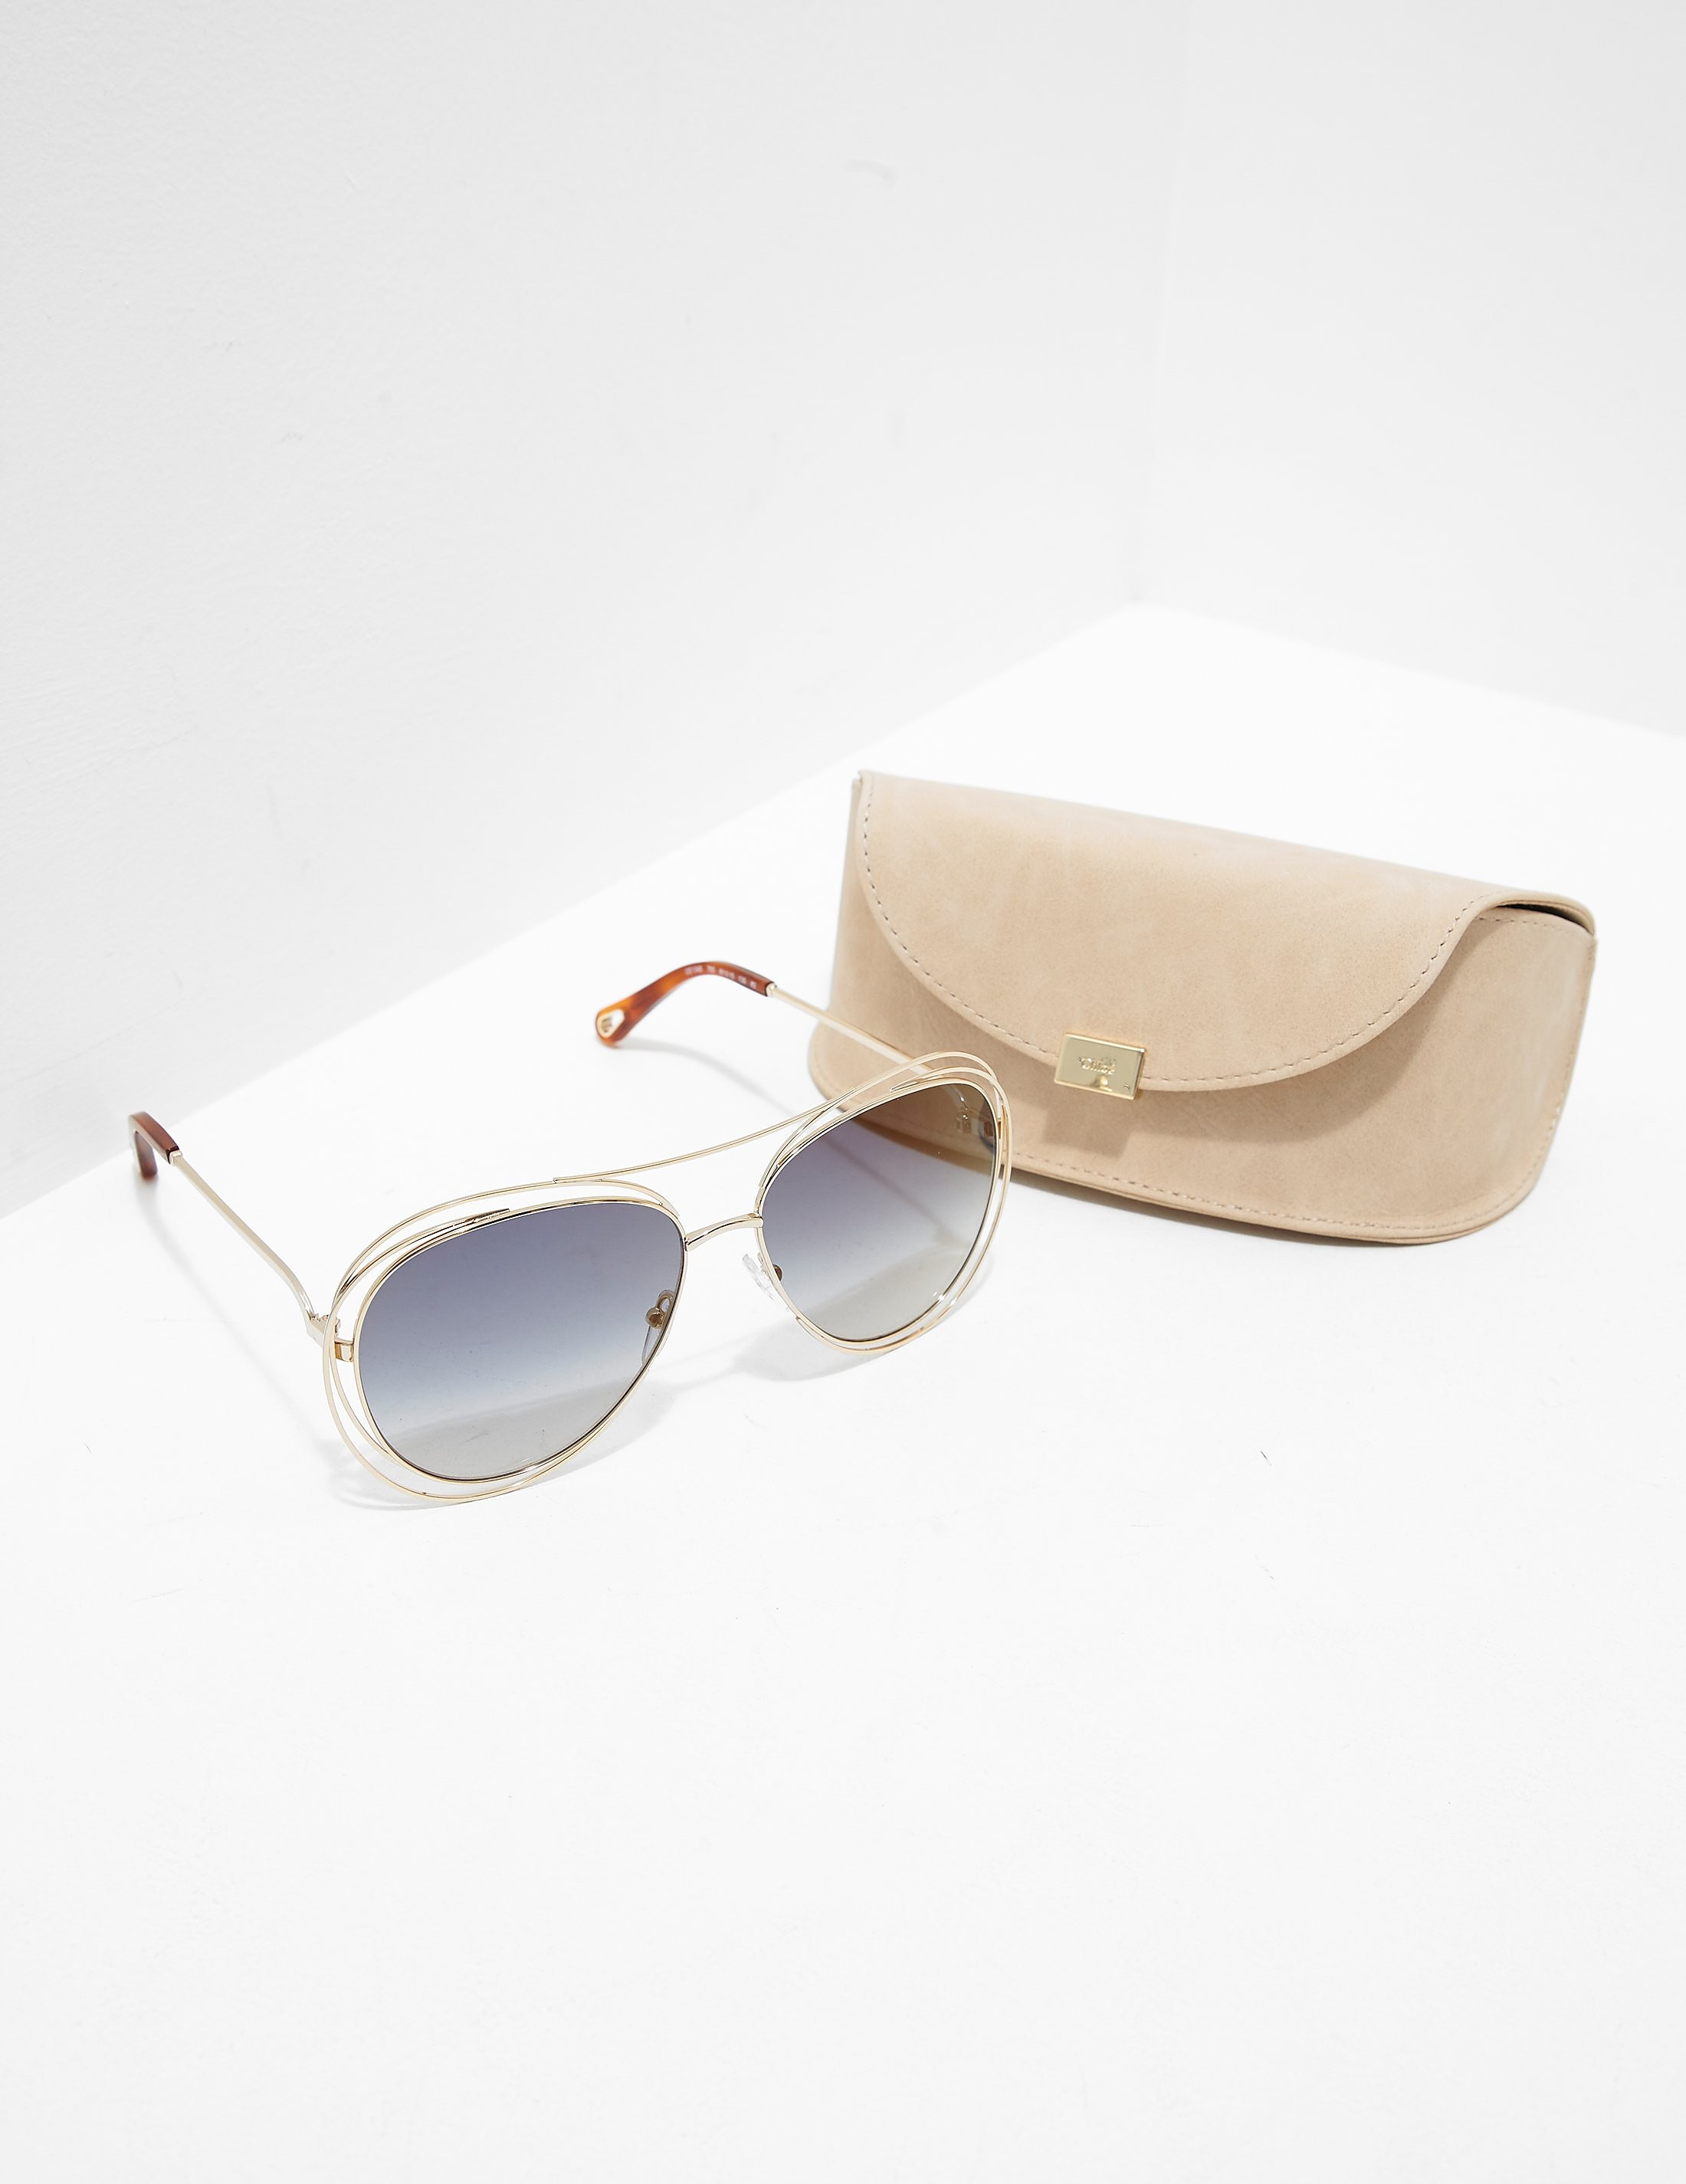 Chloe Aviator Metal Sunglasses - Online Exclusive